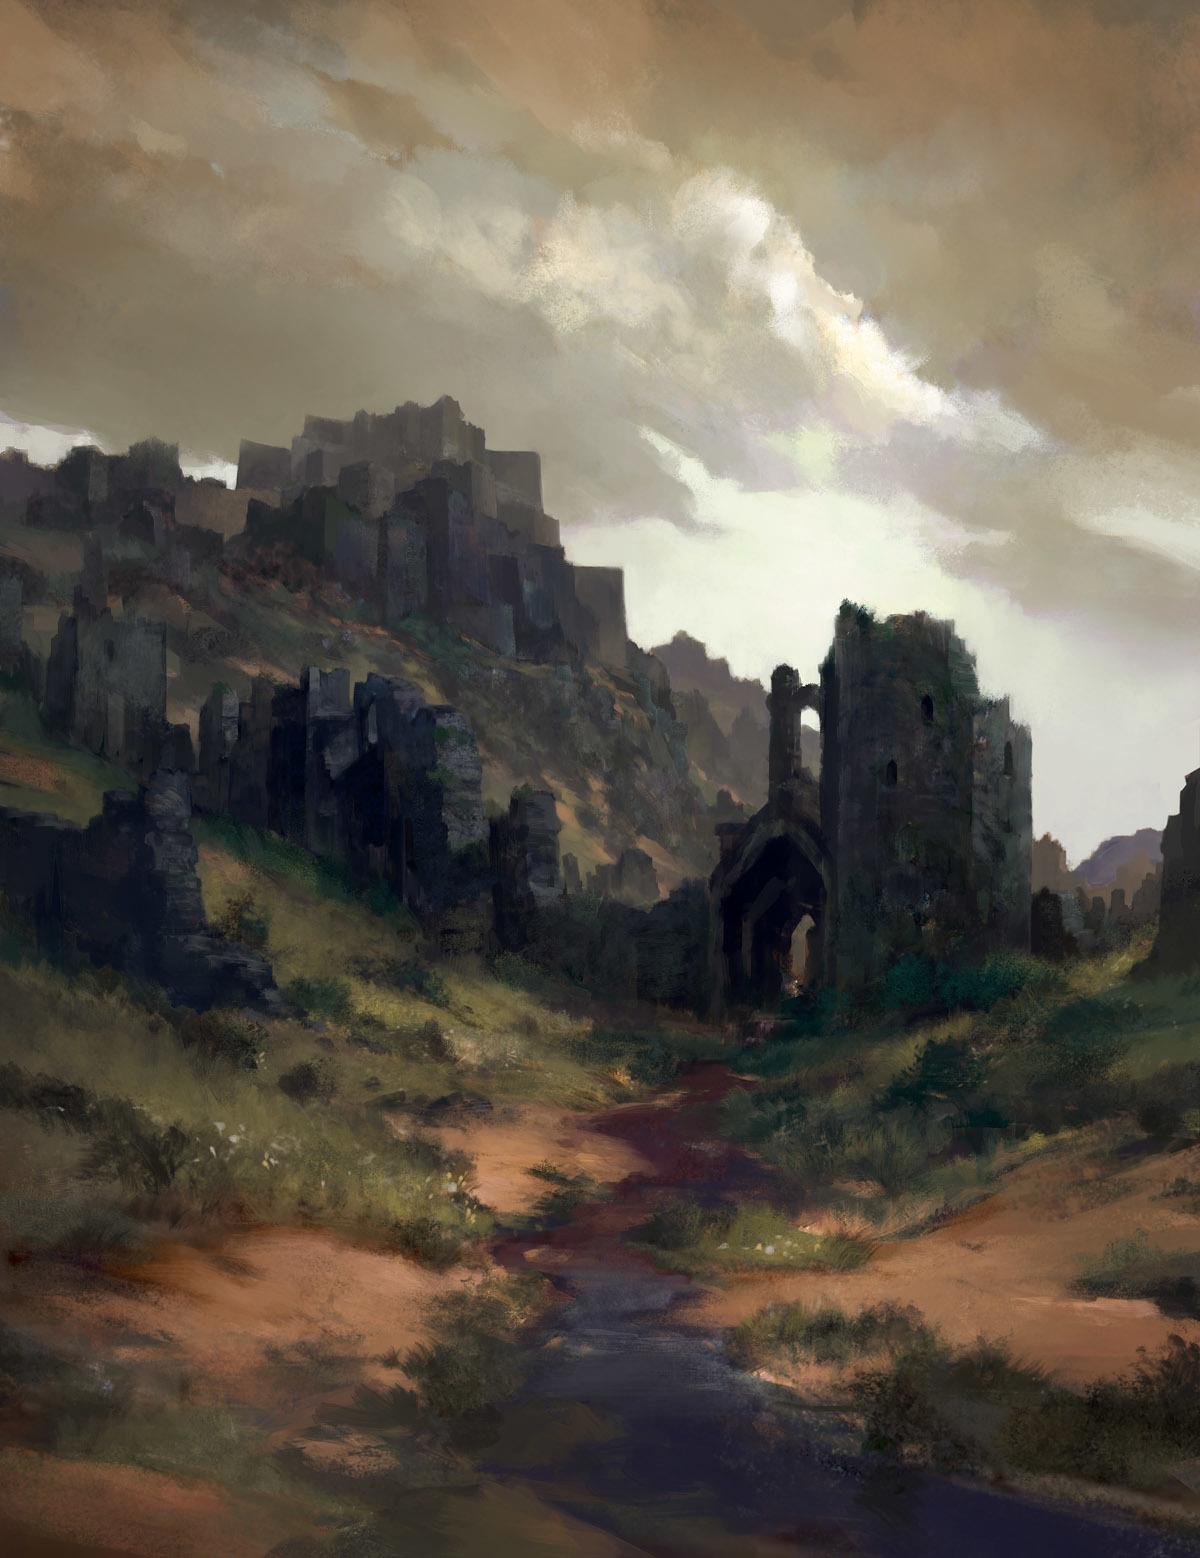 Dusint black fortress ruins 1 21029a84 0f21